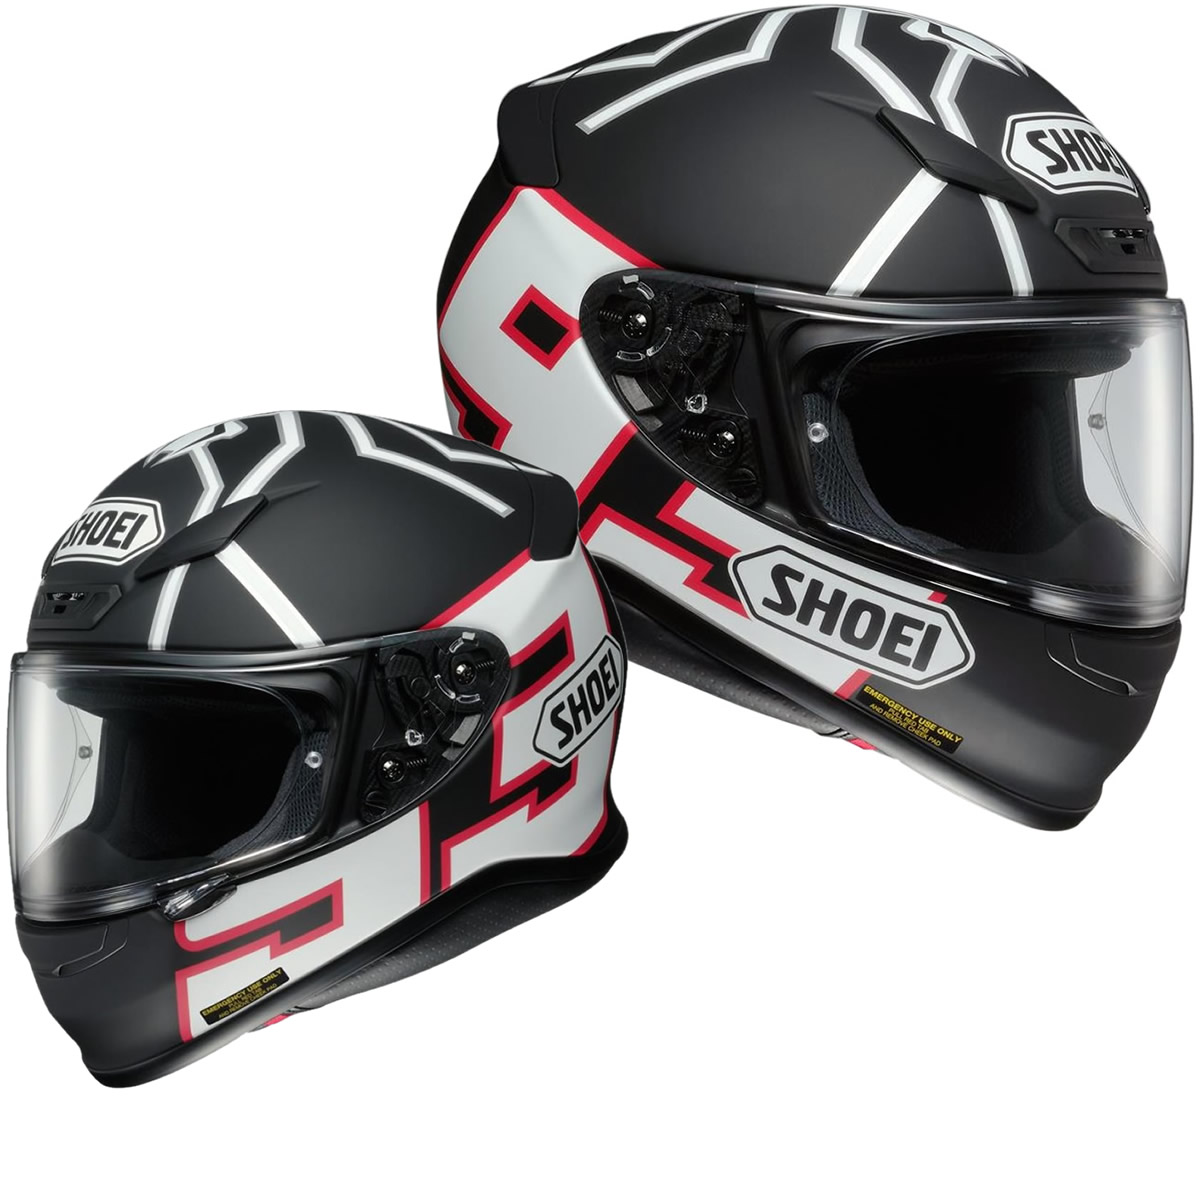 shoei nxr marquez black ant replica helmet full face helmets. Black Bedroom Furniture Sets. Home Design Ideas